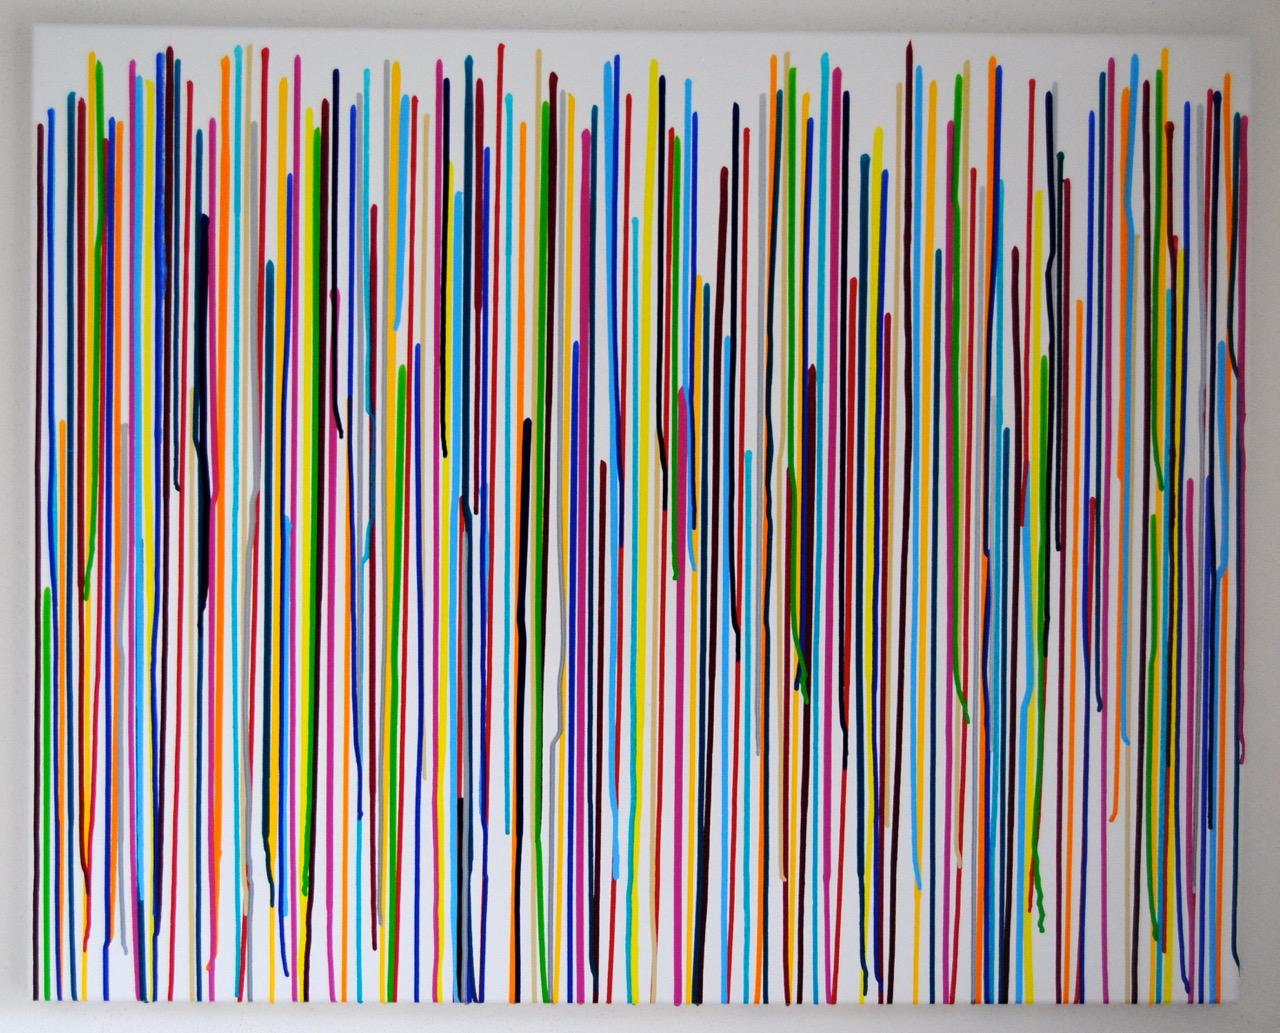 Saatchi art artist archive astrid stoeppel for Modern art gallery online